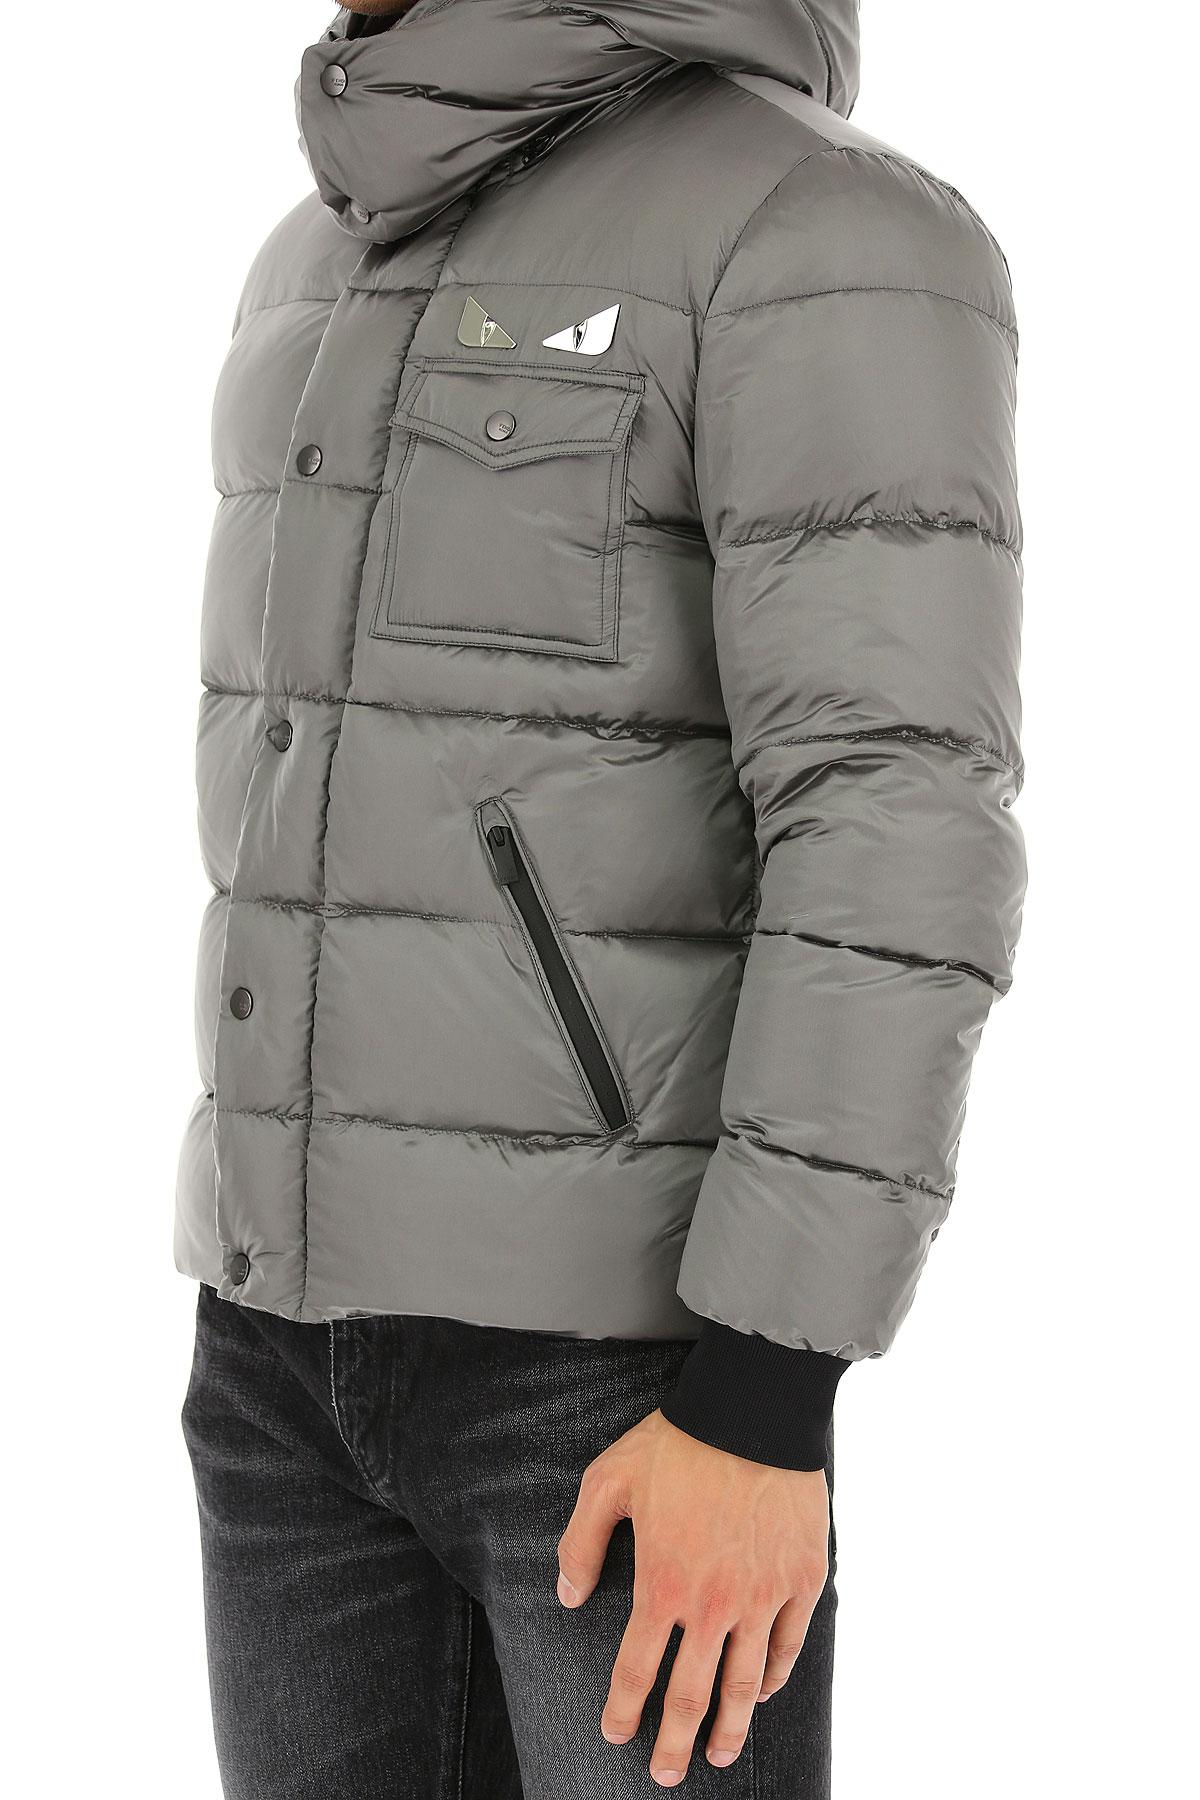 Fendi Synthetic Clothing For Men in Grey for Men